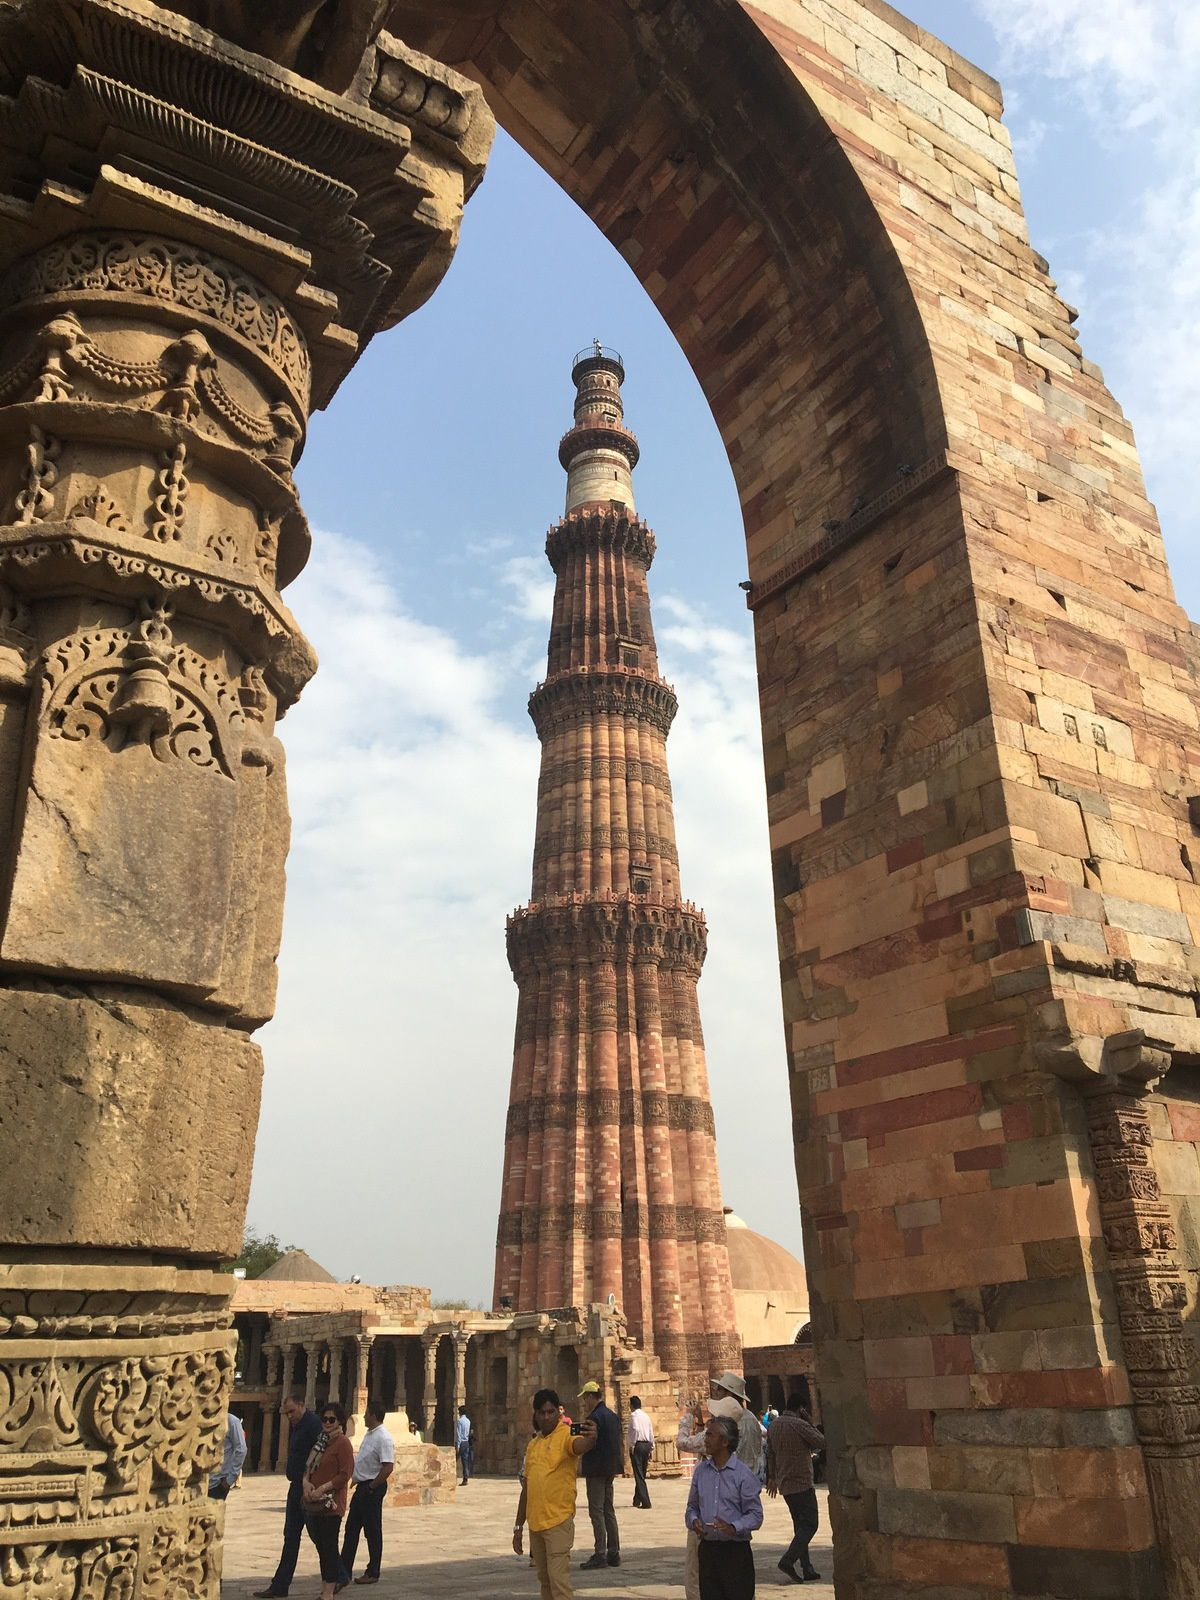 Le minaret de Qutub qui domine la ville de ses rêves de grandeur